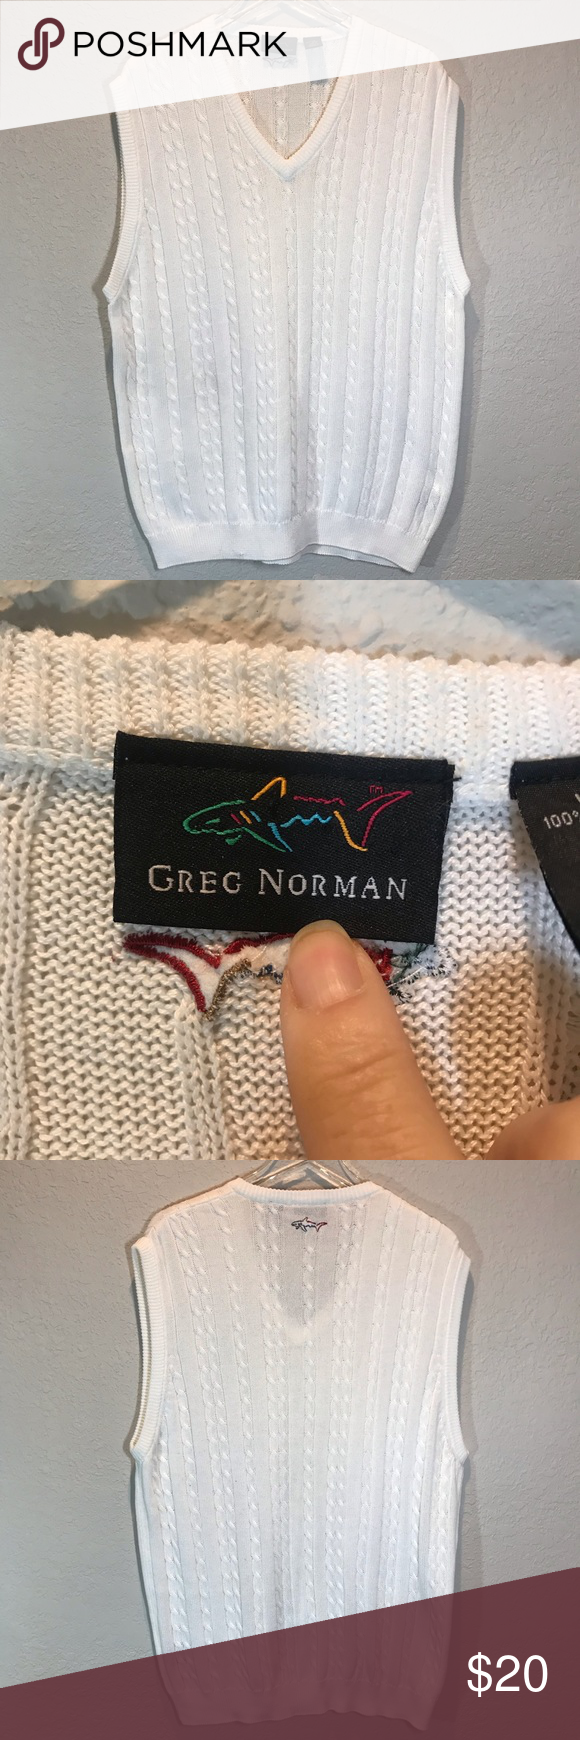 Greg Norman Men S Sweater Vest Sz Large Cream Cable Knit Sweater Vest From Greg Norman V Neck Collar Greg Norman Gr Sweater Vest Greg Norman Logo Embroidered